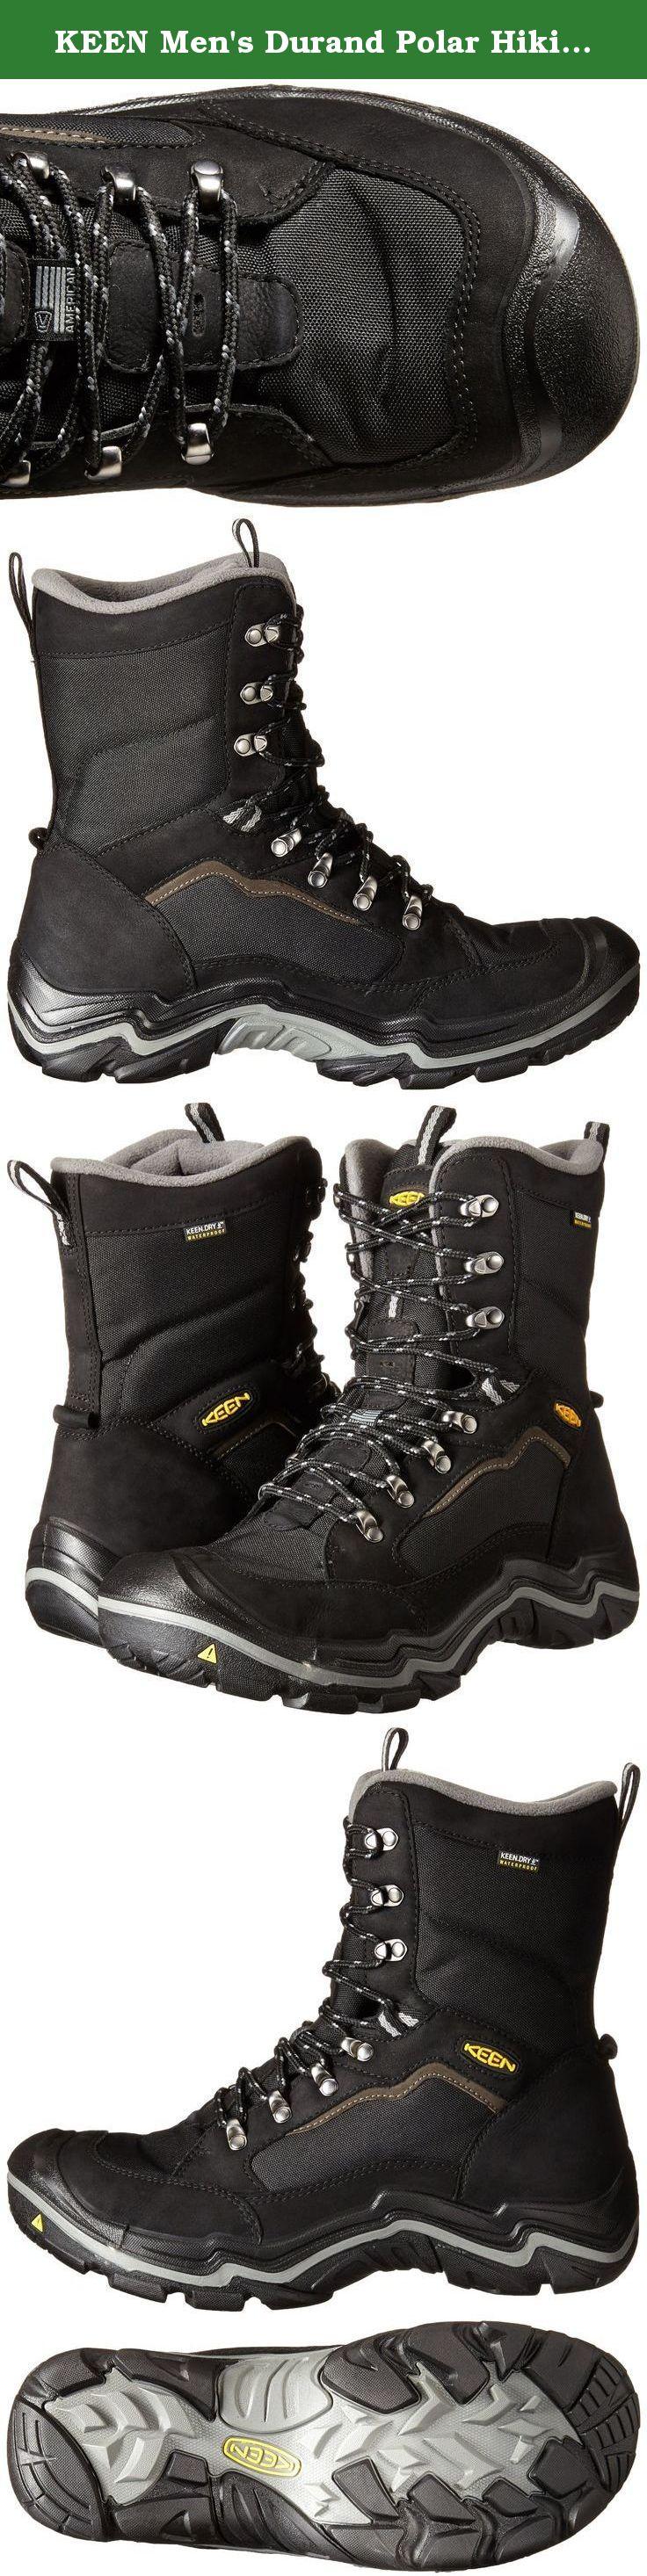 b88e9f79db6 KEEN Men's Durand Polar Hiking Boot. FEATURES of the Keen Men's ...